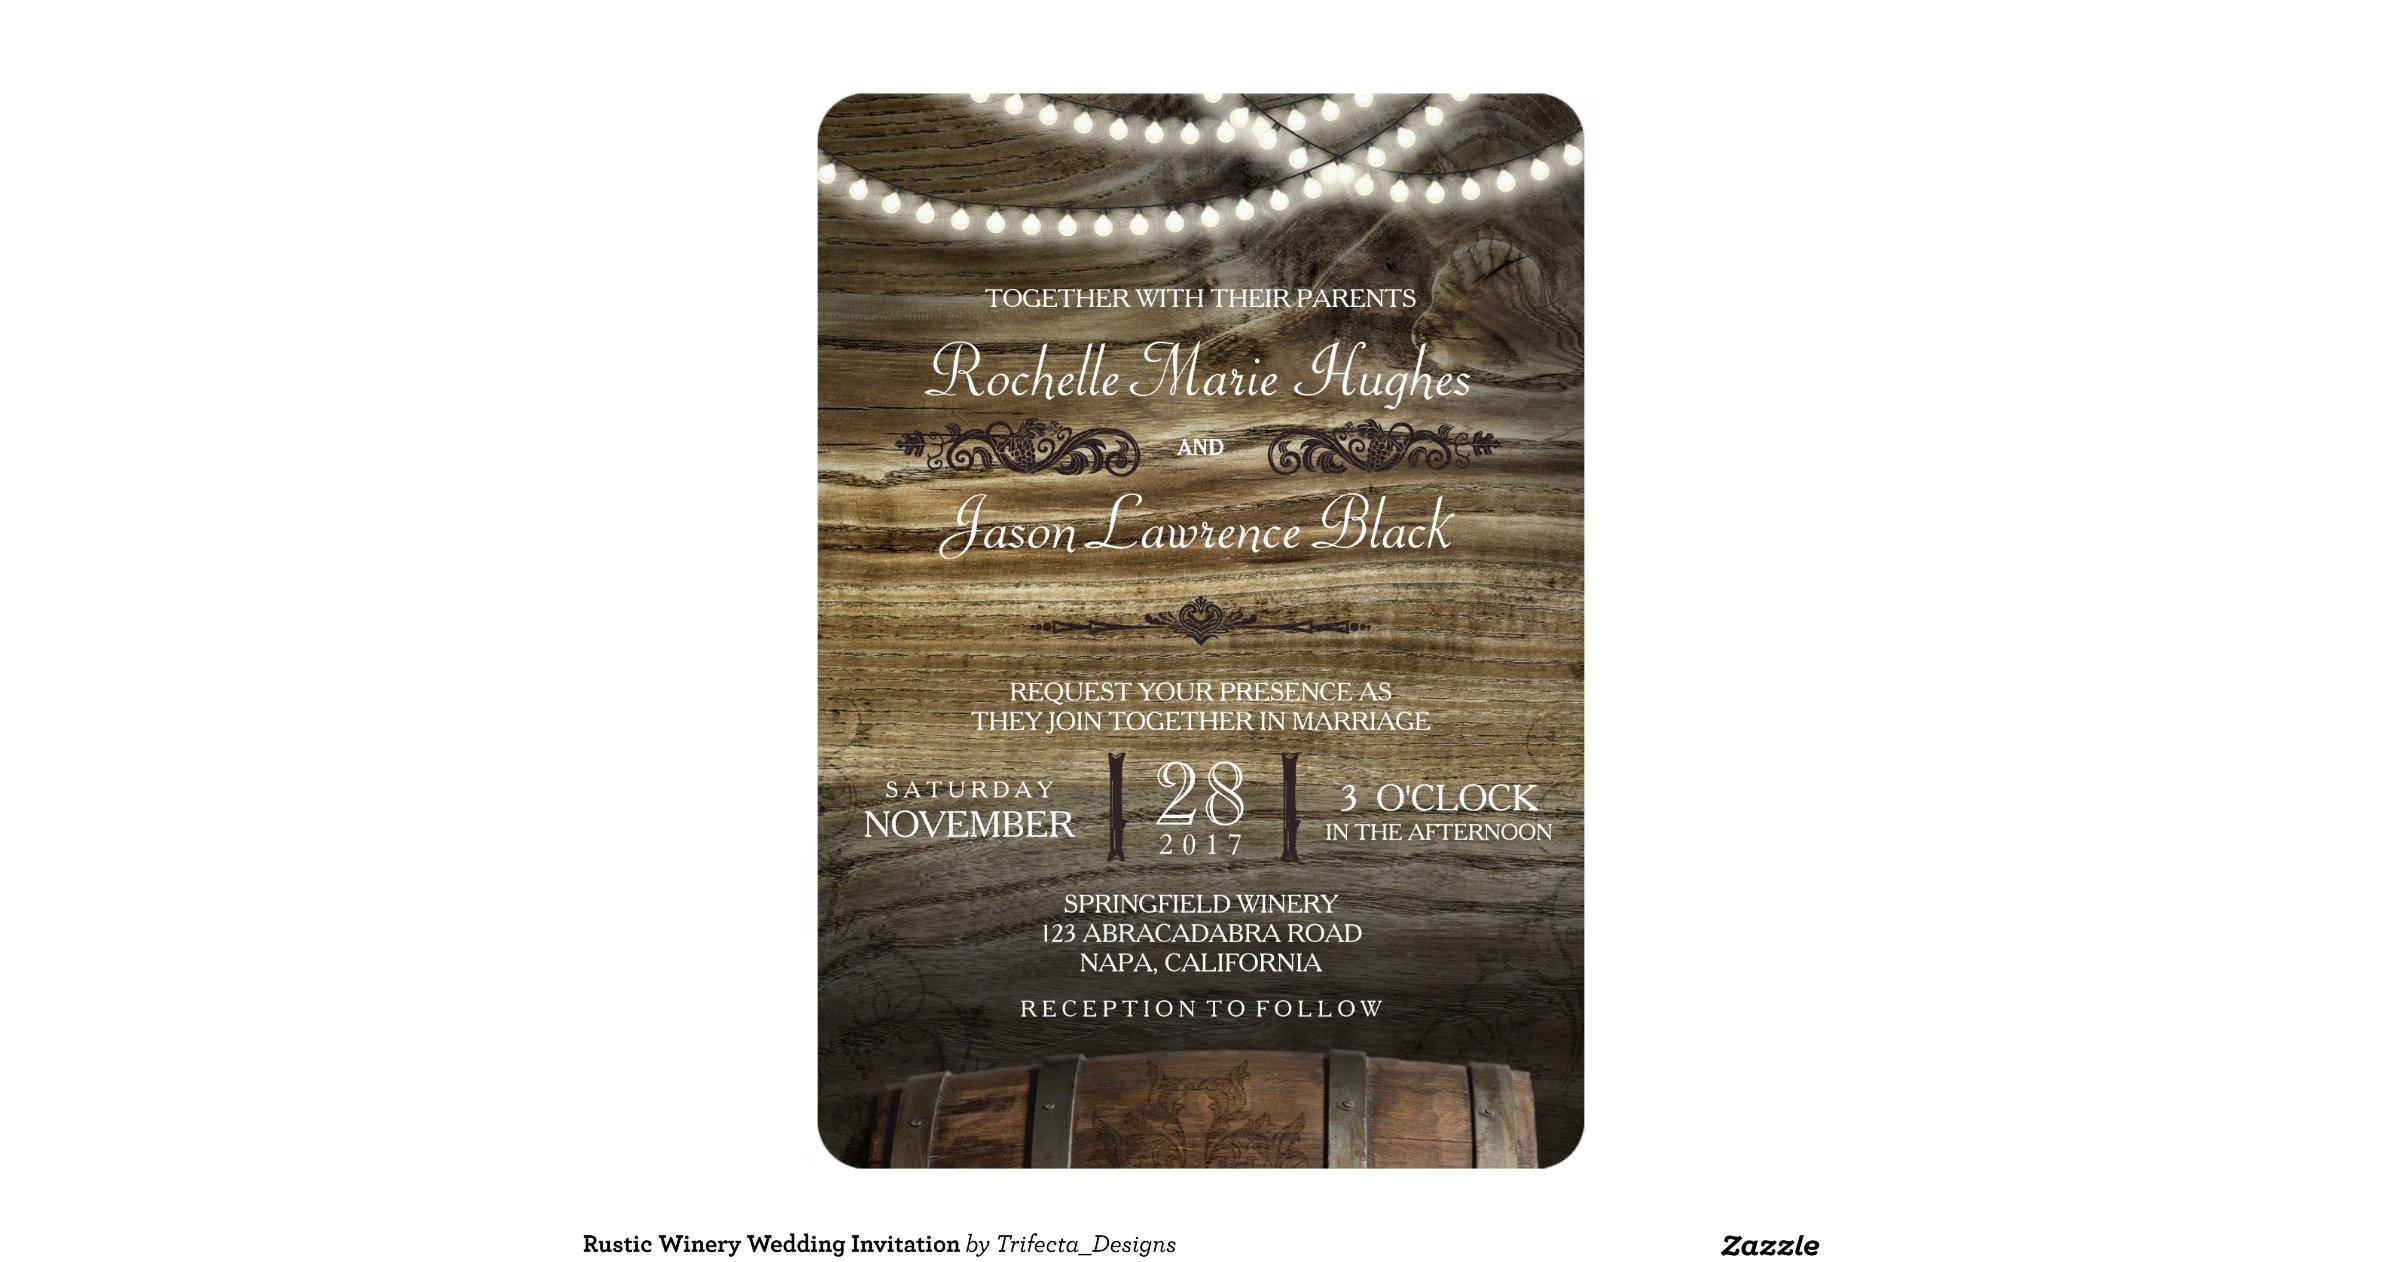 rustic winery wedding invitations - 28 images - rustic vineyard ...